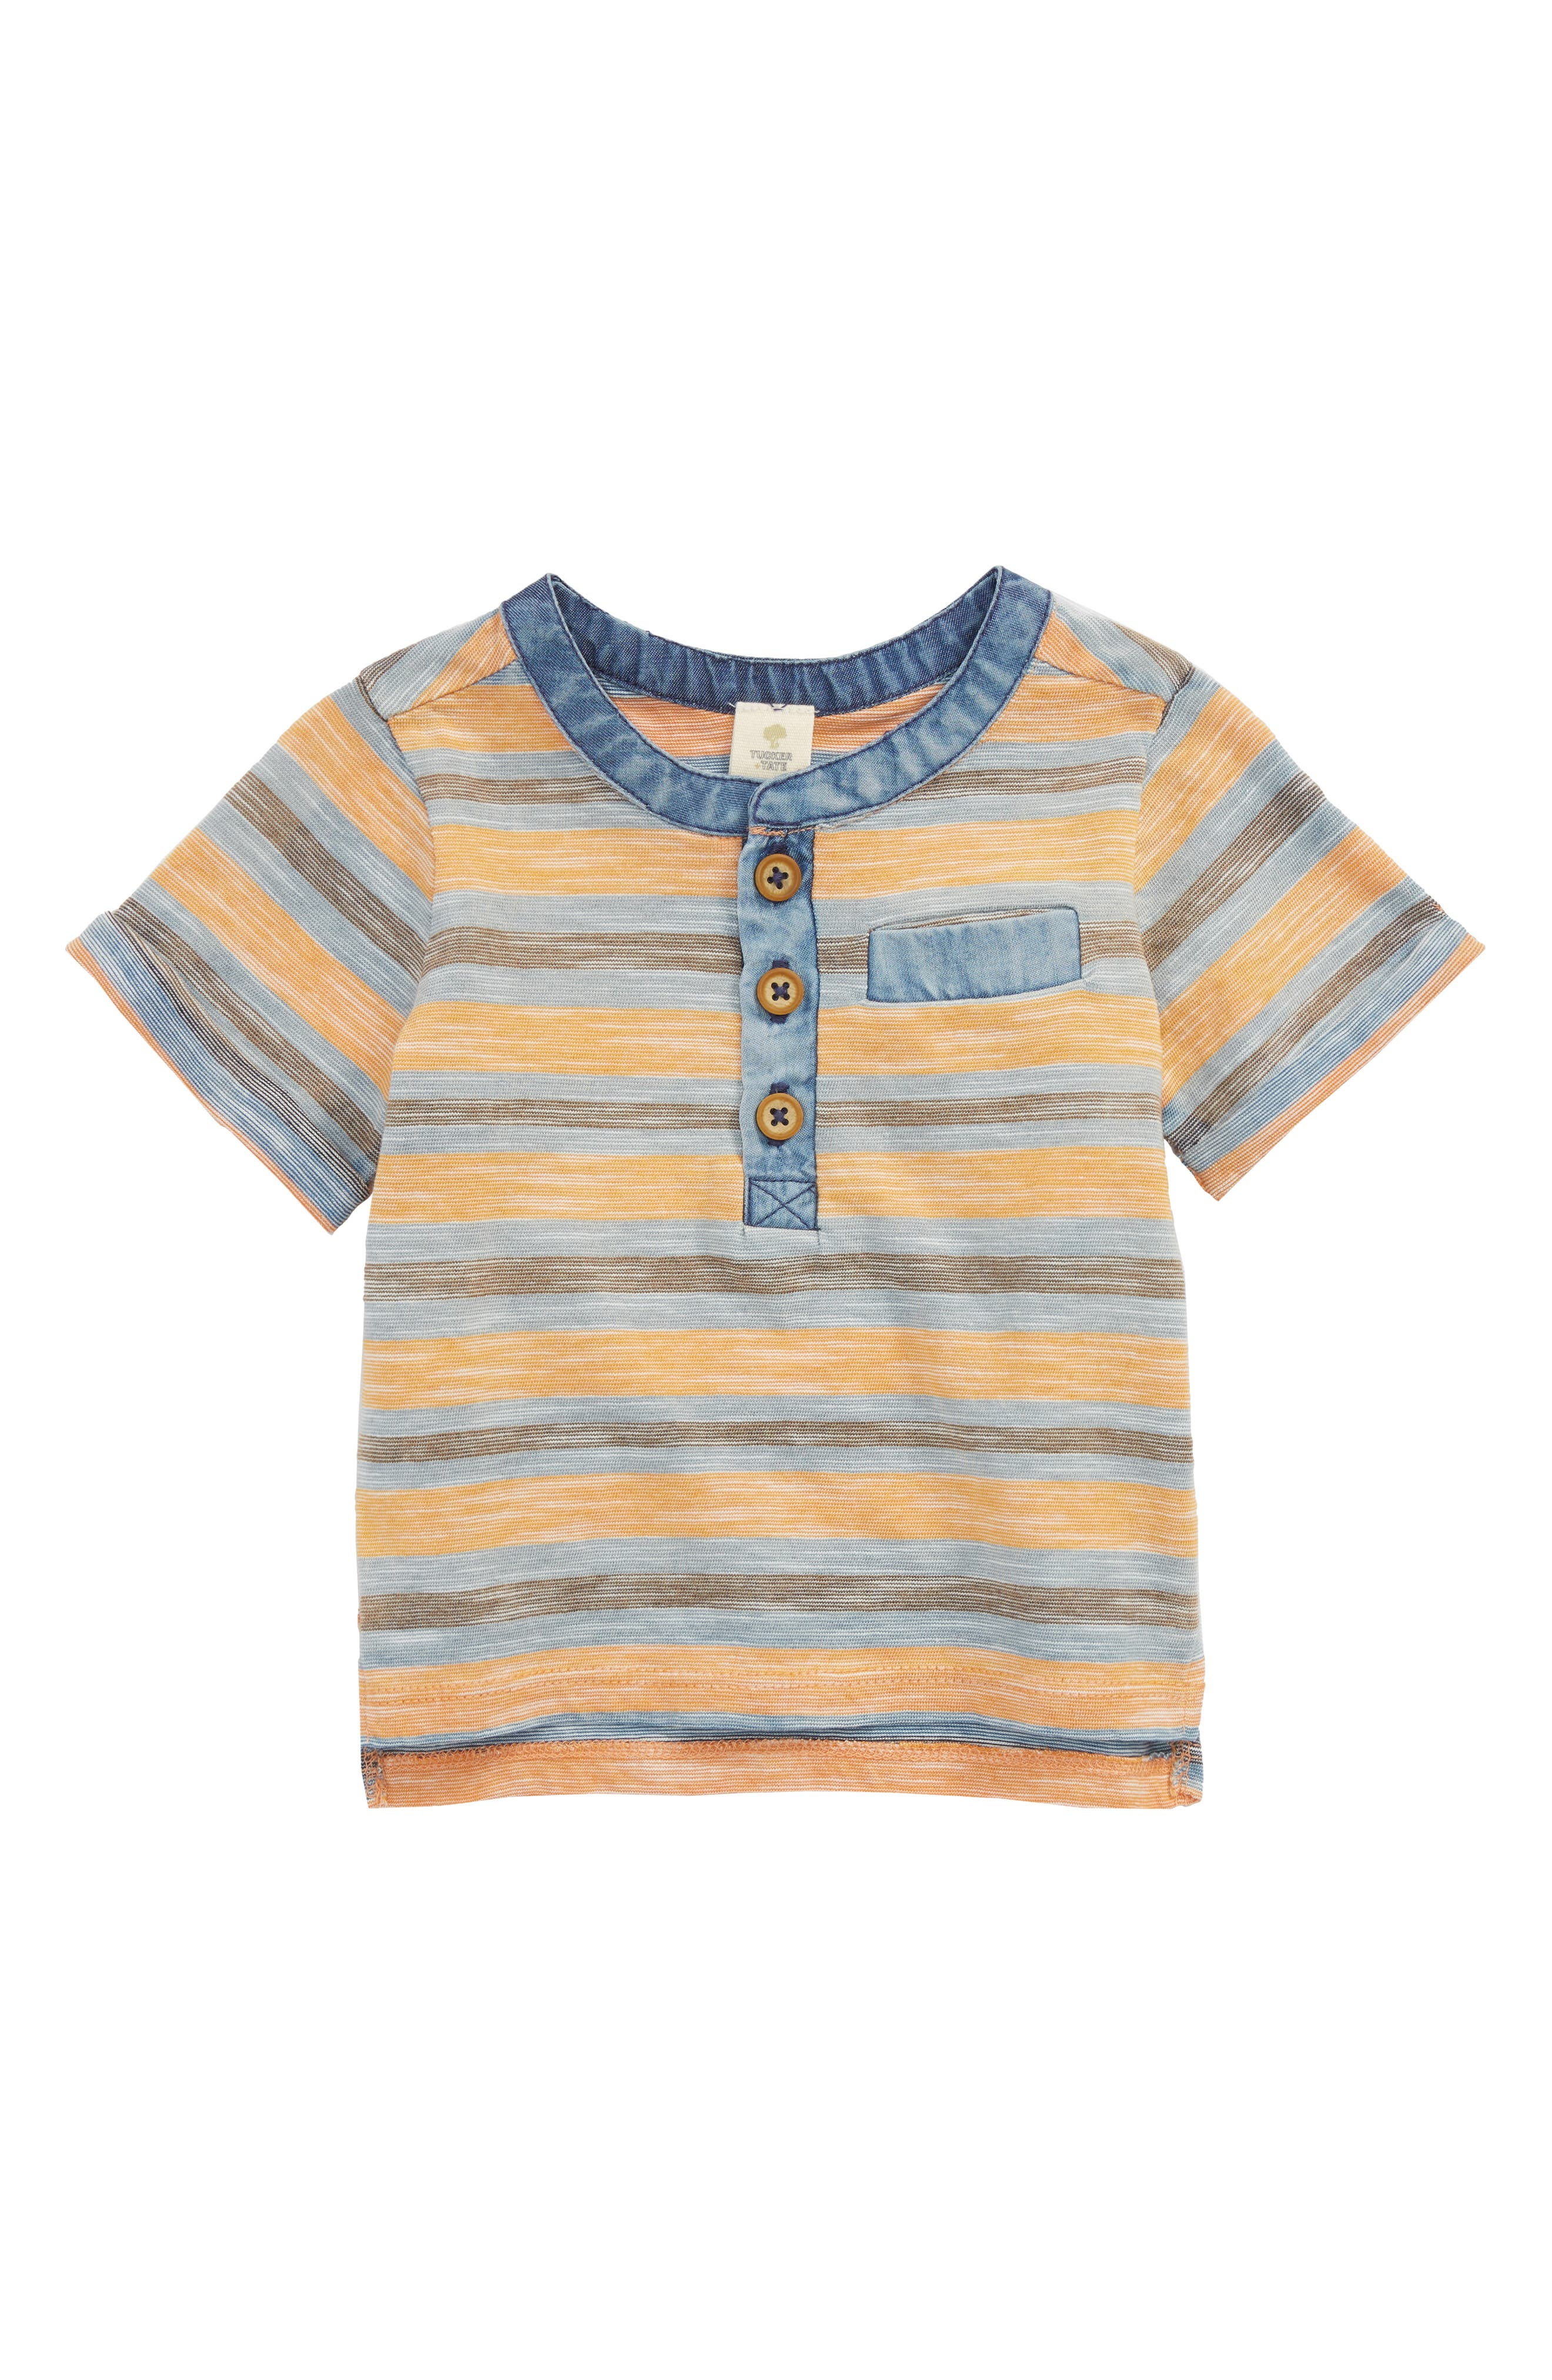 Reverse Stripe Henley,                         Main,                         color, Orange Glaze- Blue Stripe